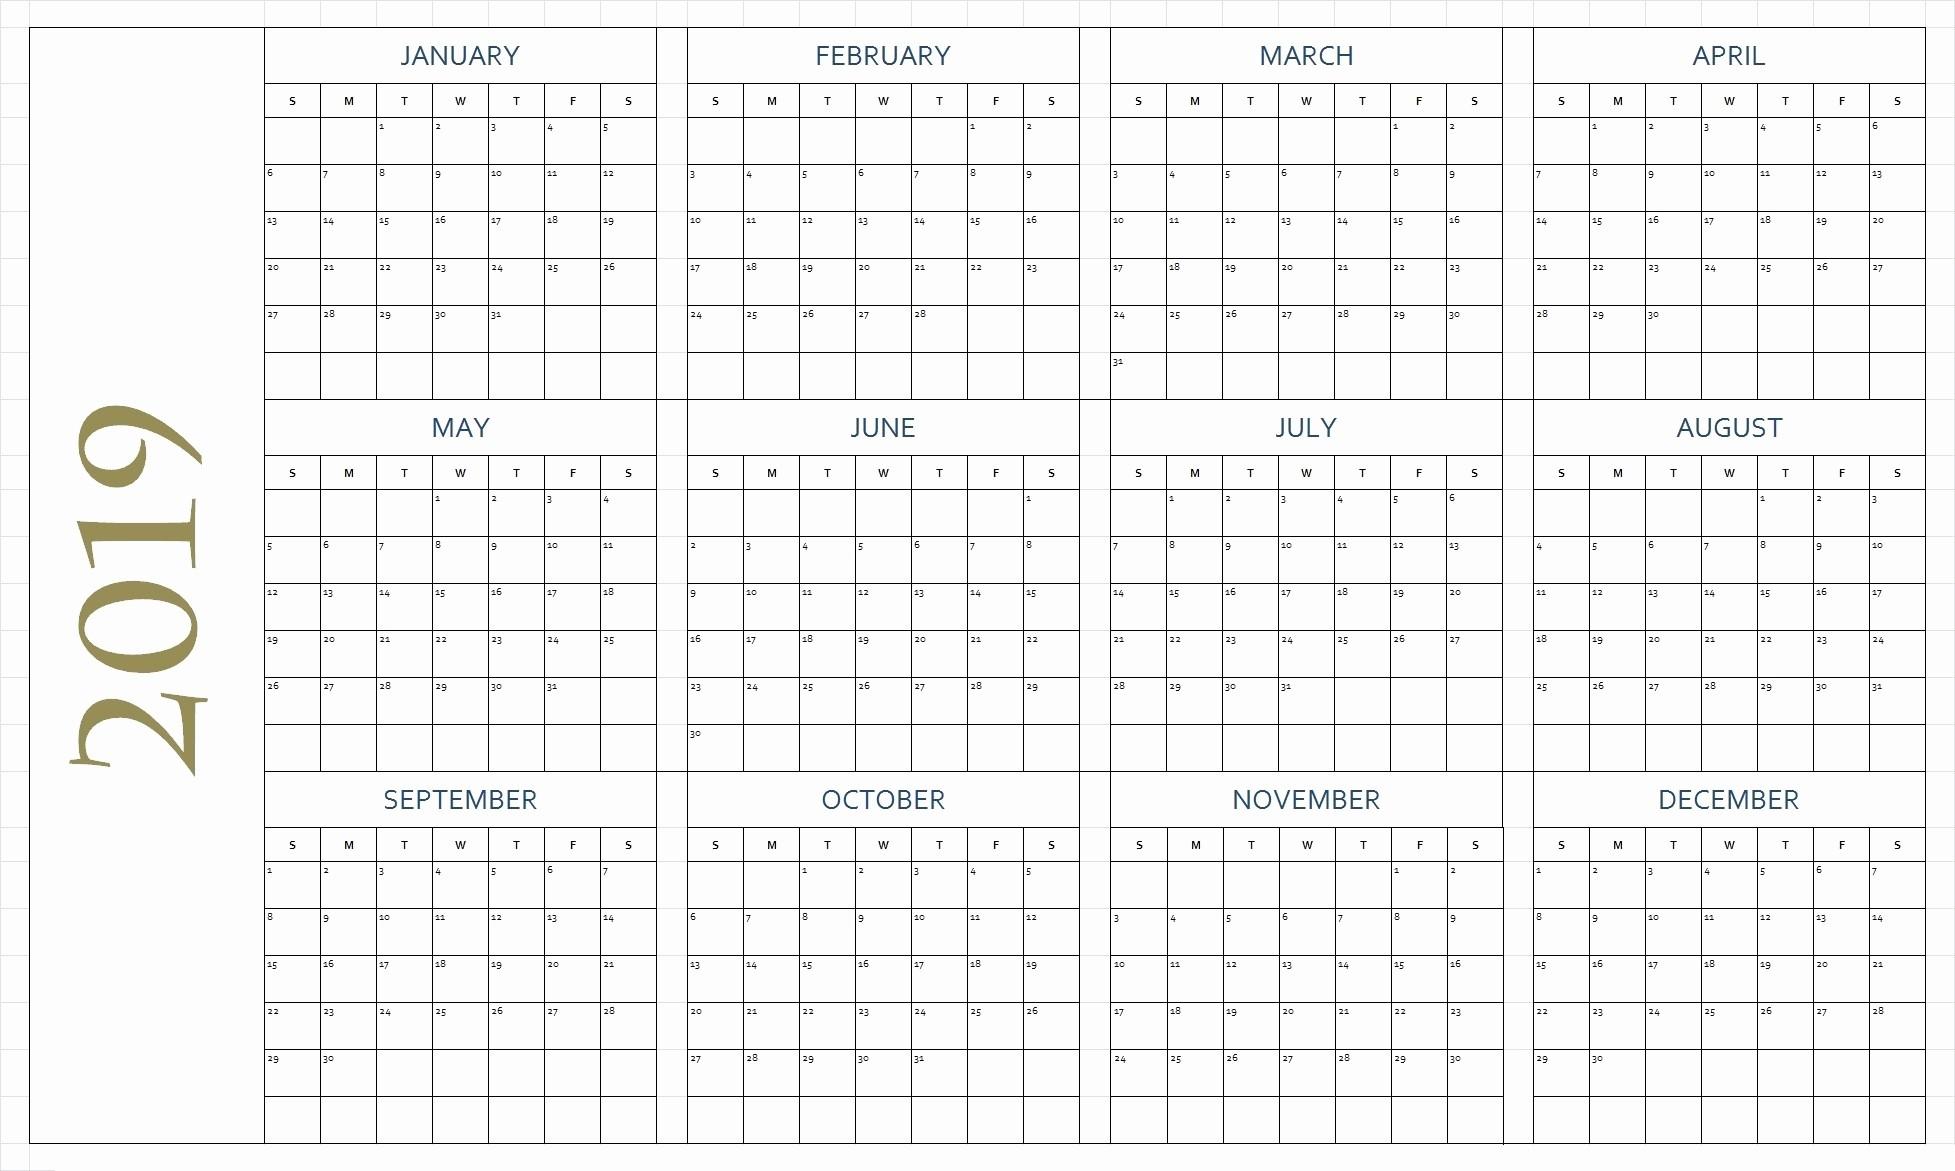 Free Printable 2019 Yearly Calendar Inspirational Free Printable Calendar 2019 In Pdf Word Excel Template